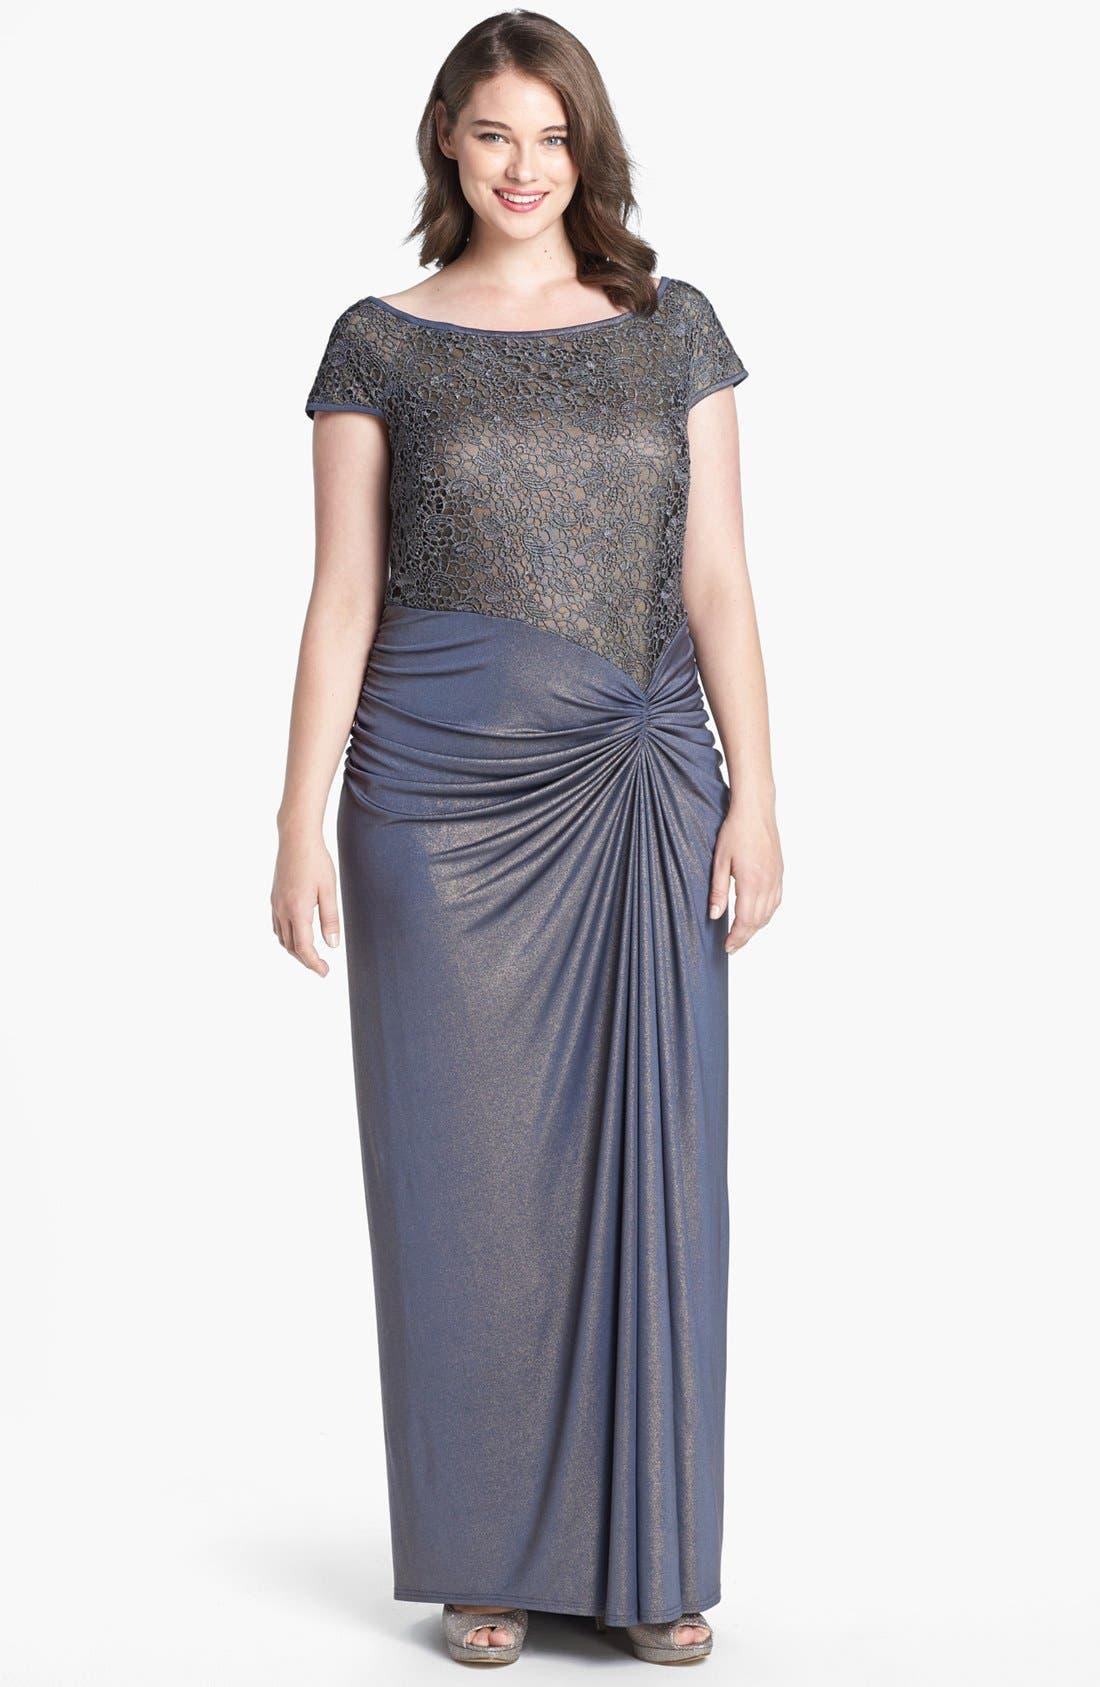 Alternate Image 1 Selected - Tadashi Shoji Metallic Lace & Jersey Gown (Plus Size)